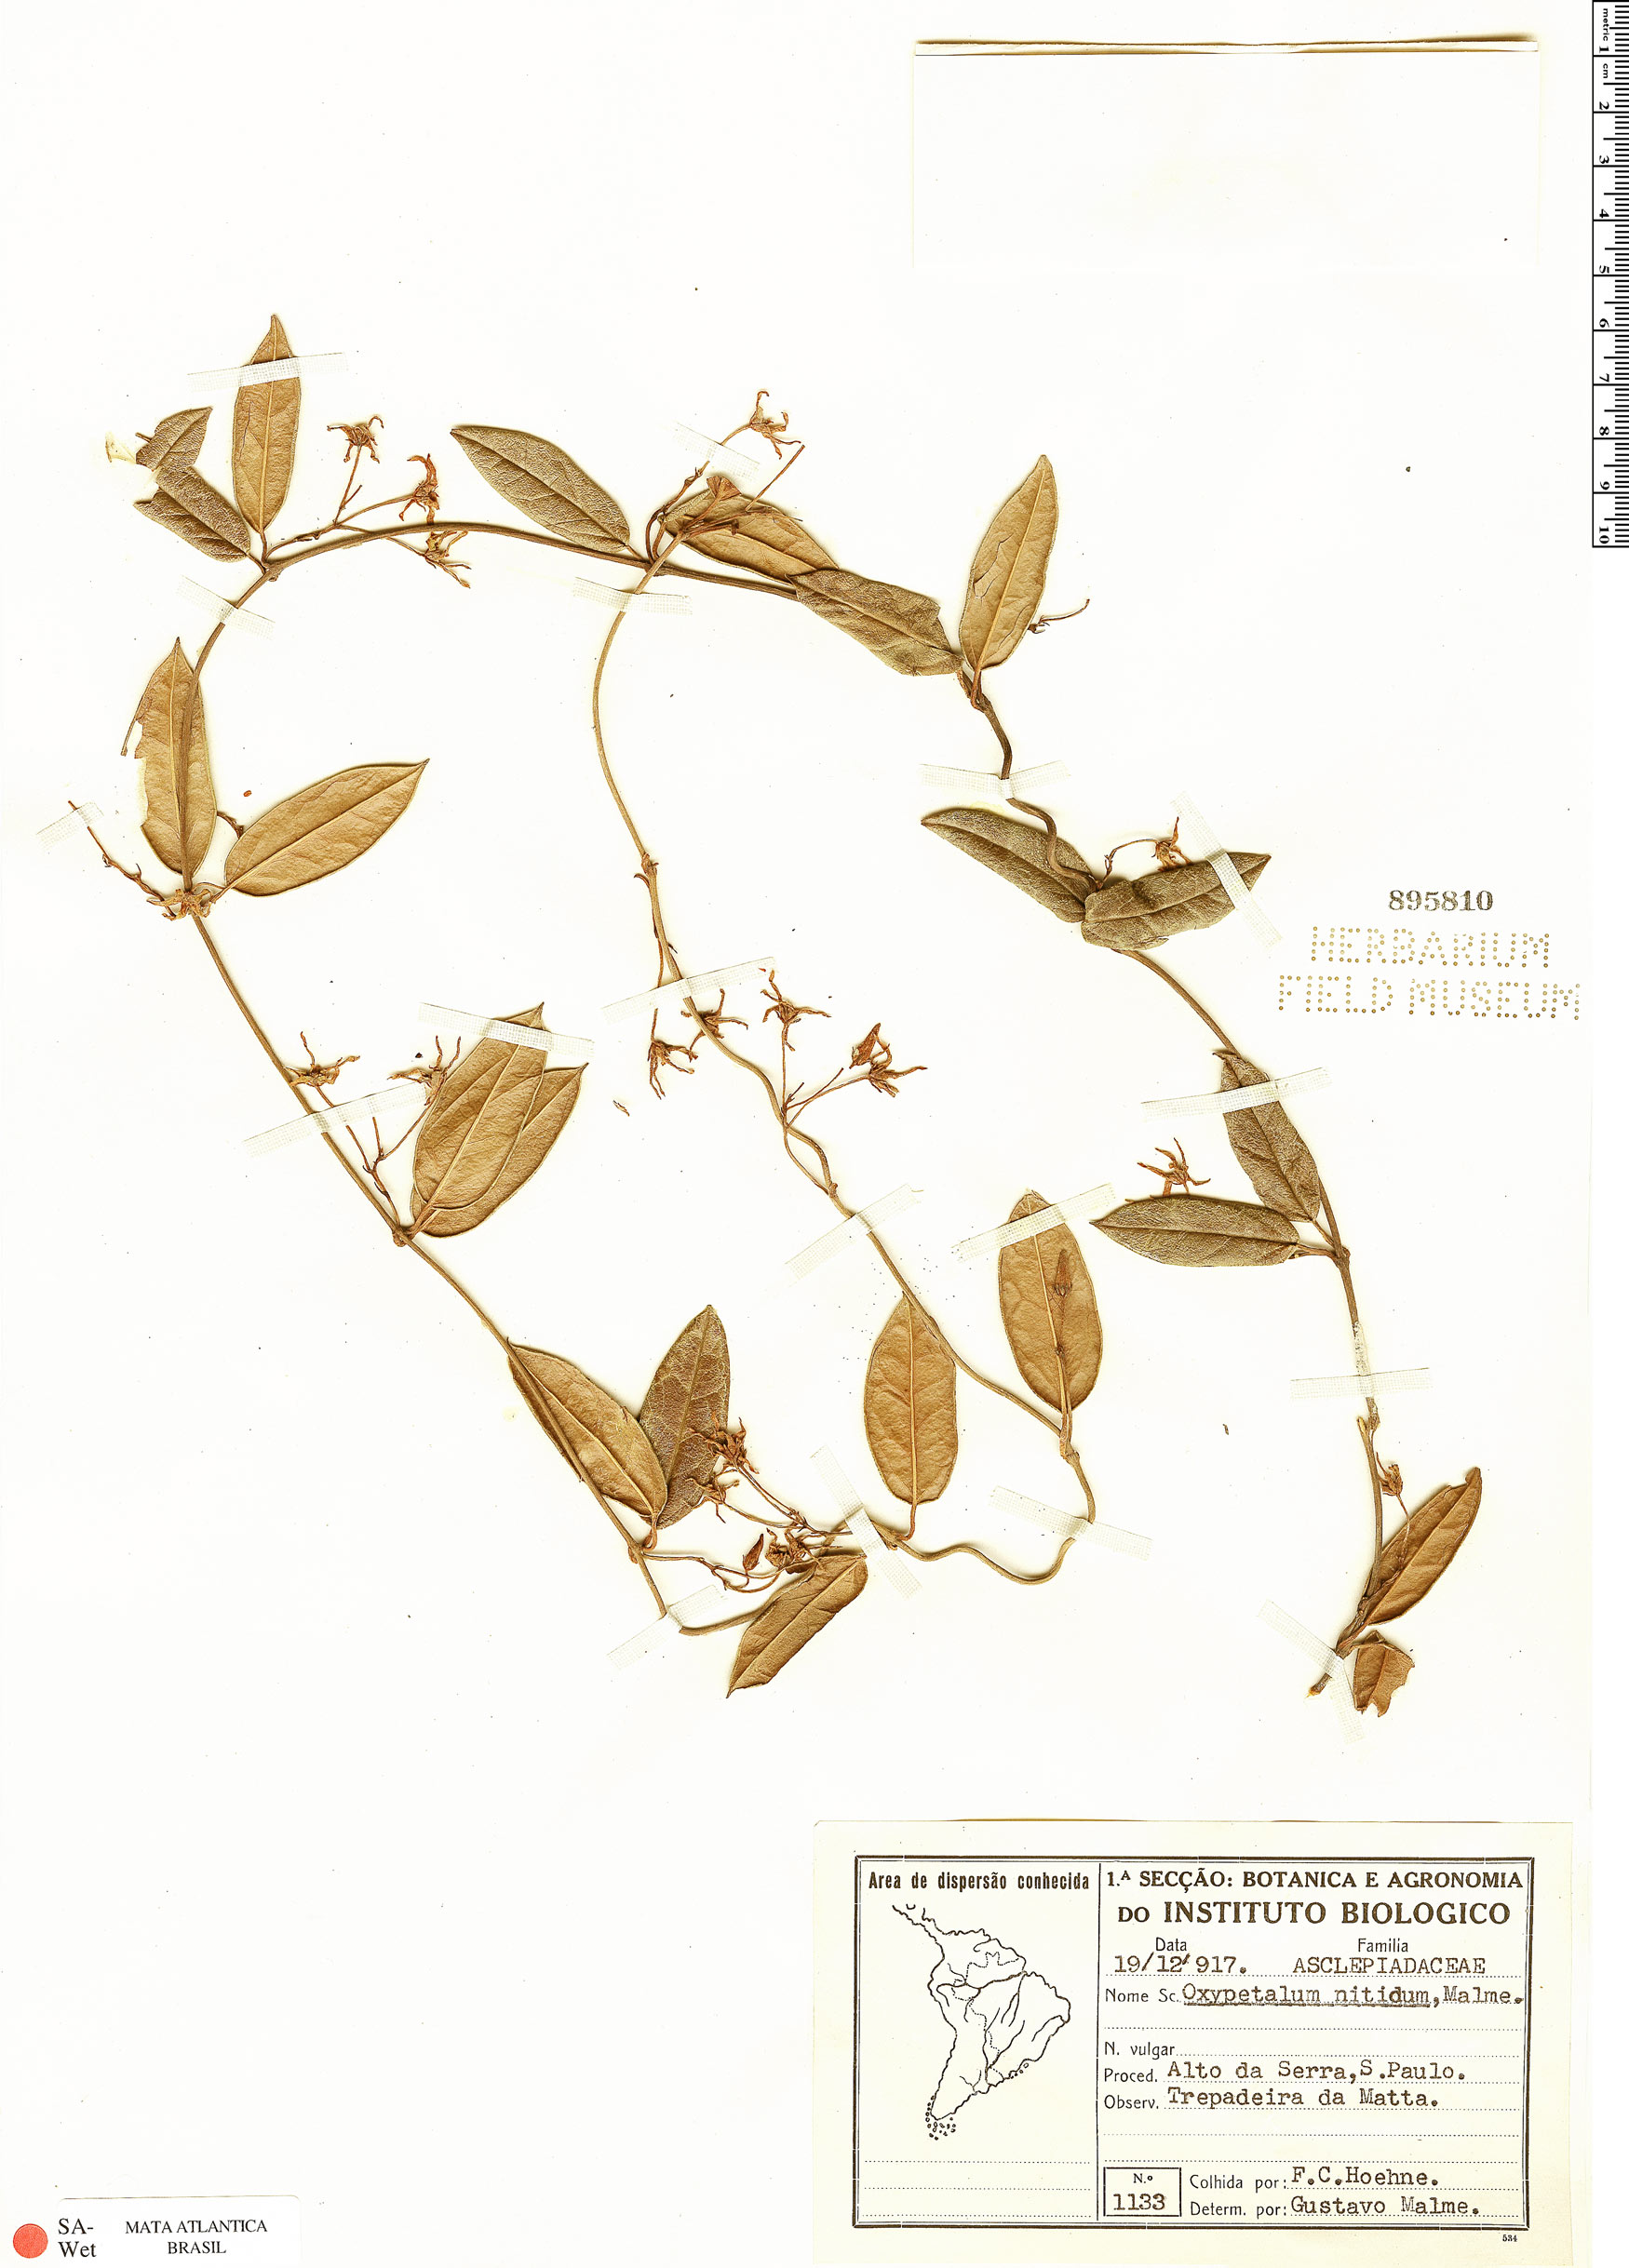 Specimen: Oxypetalum nitidum